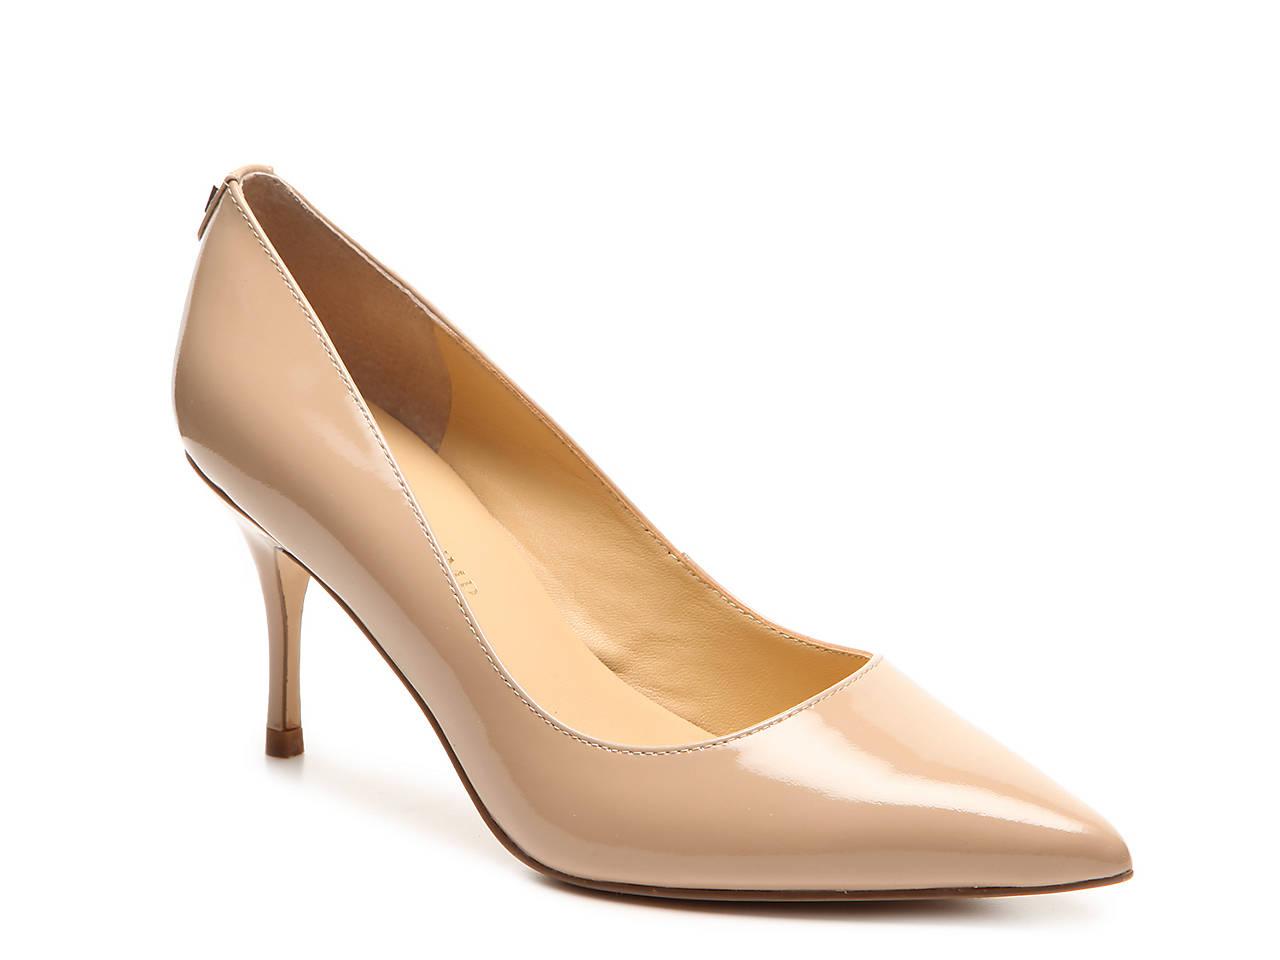 7aef4aee5fd8 Ivanka Trump Boni Pump Women s Shoes